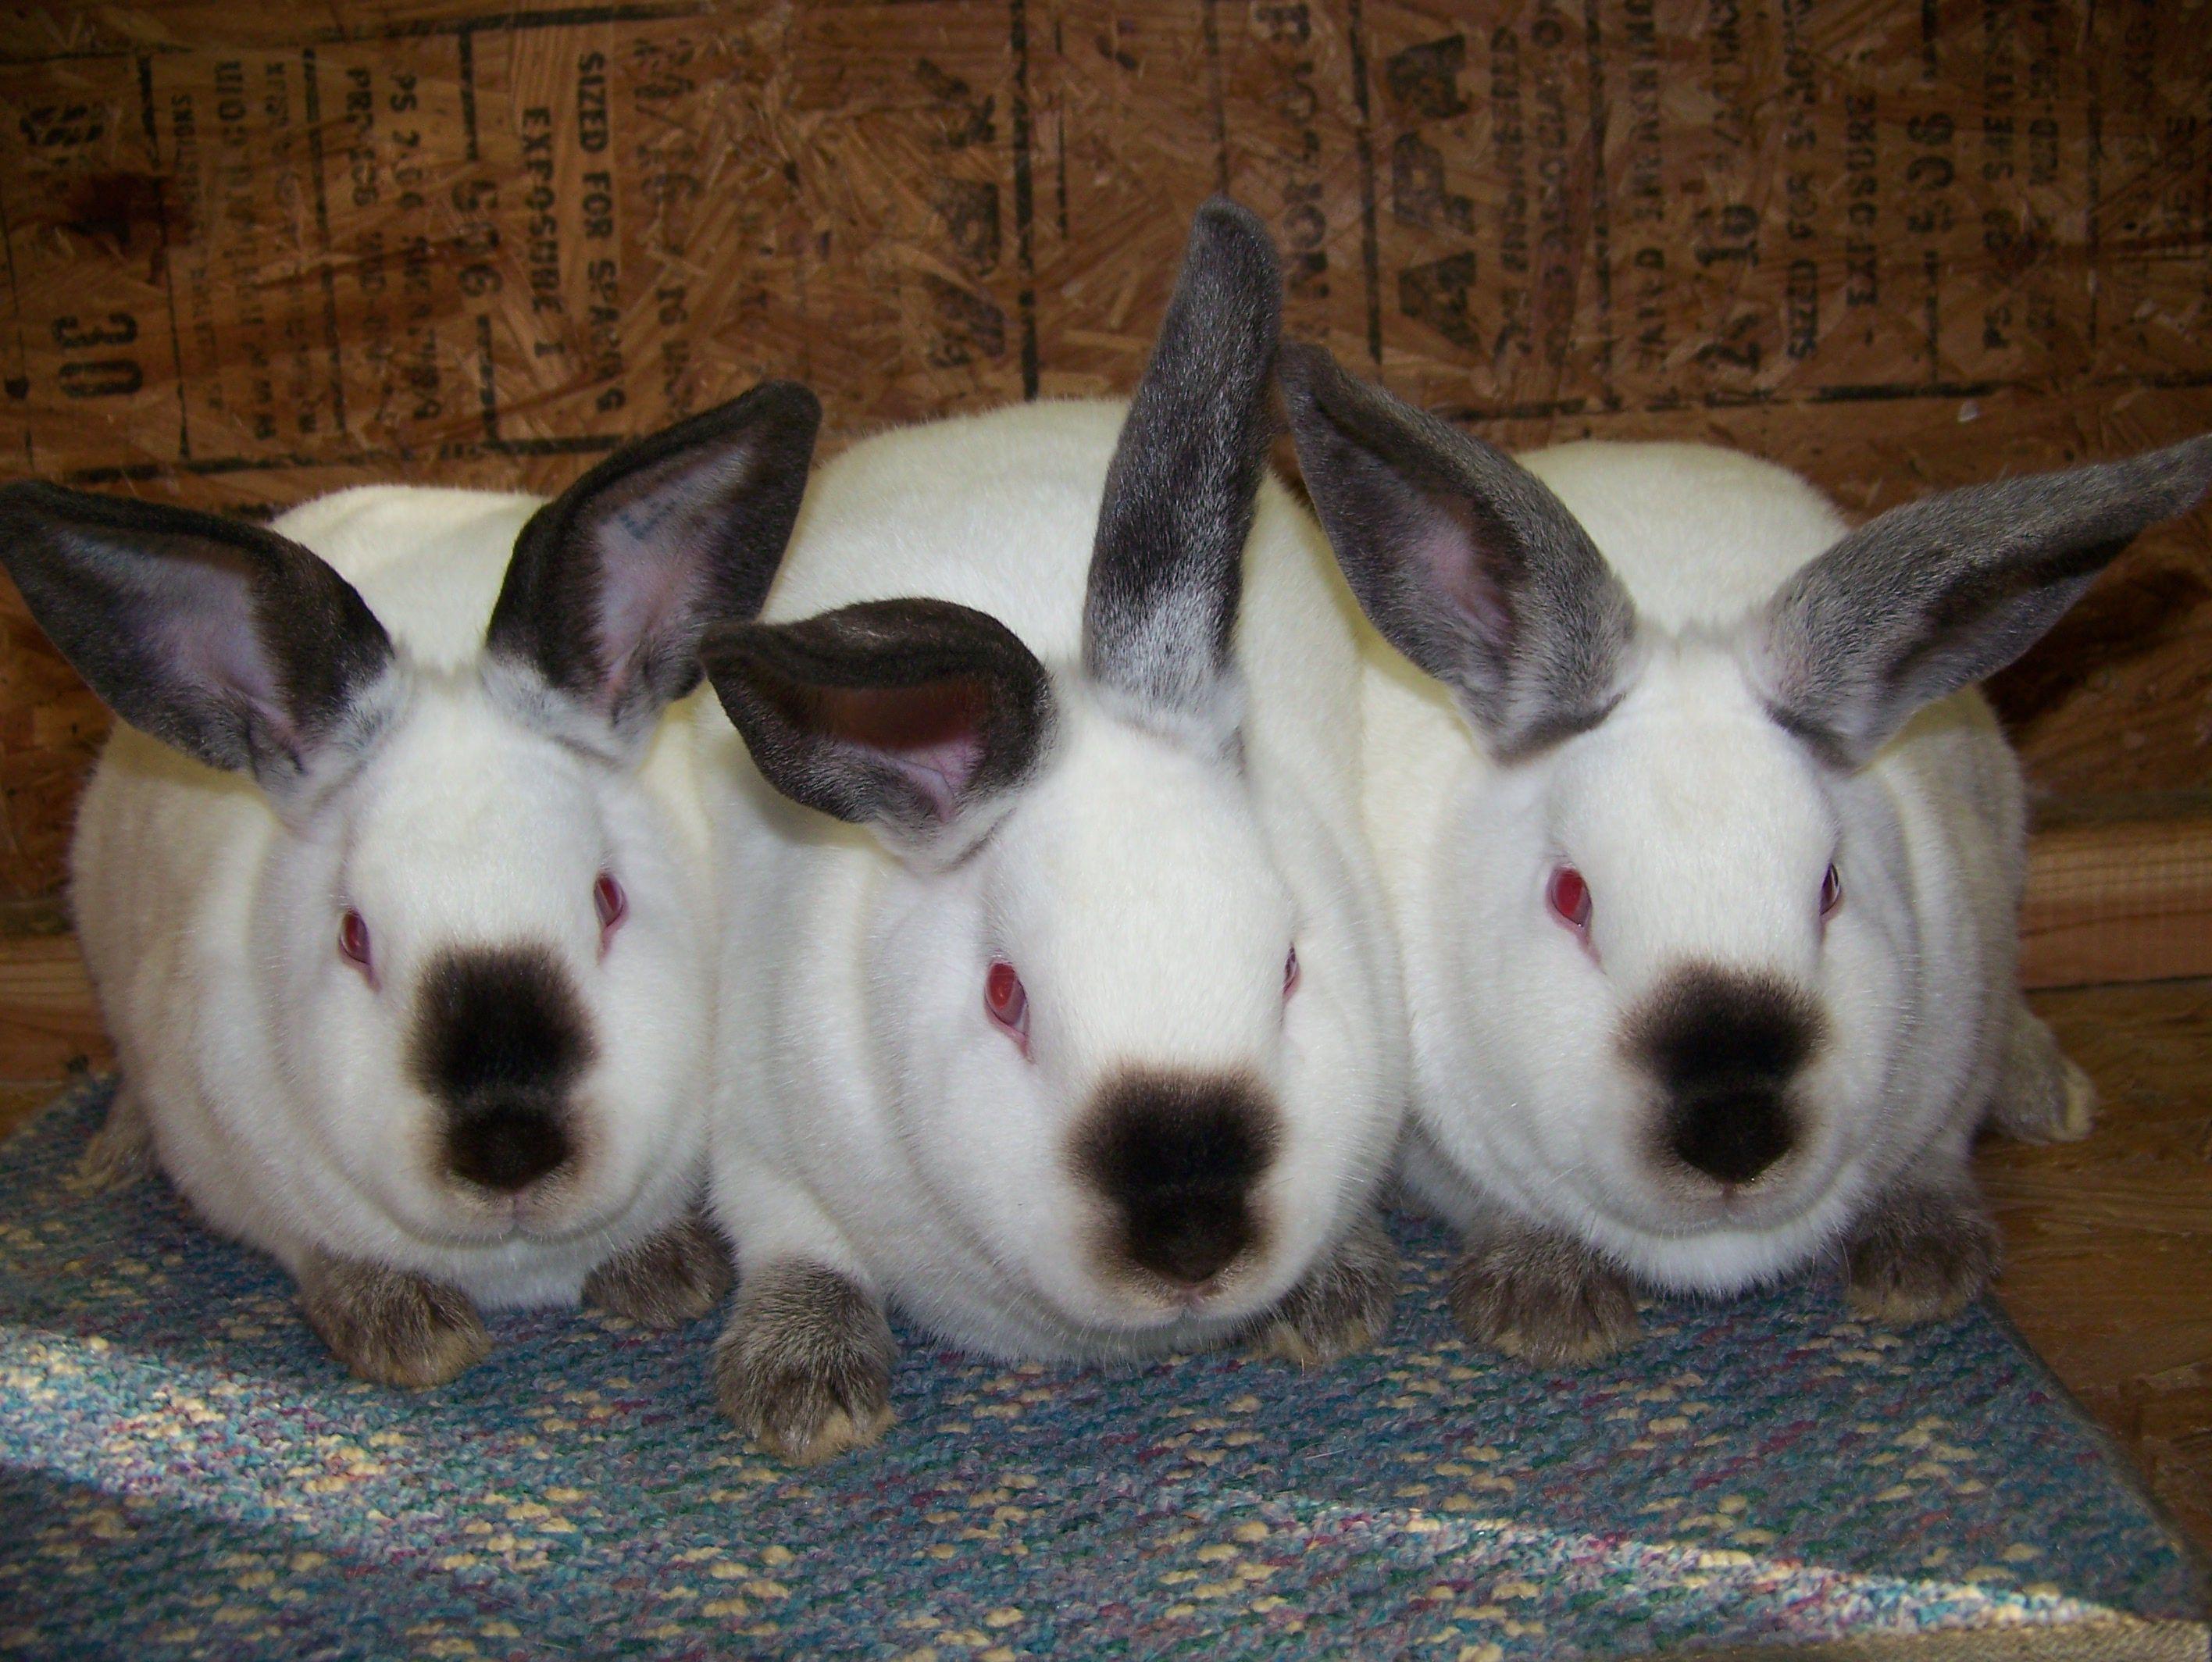 California Rabbit Google Search Rabbit Breeds Meat Rabbits Breeds Raising Rabbits For Meat